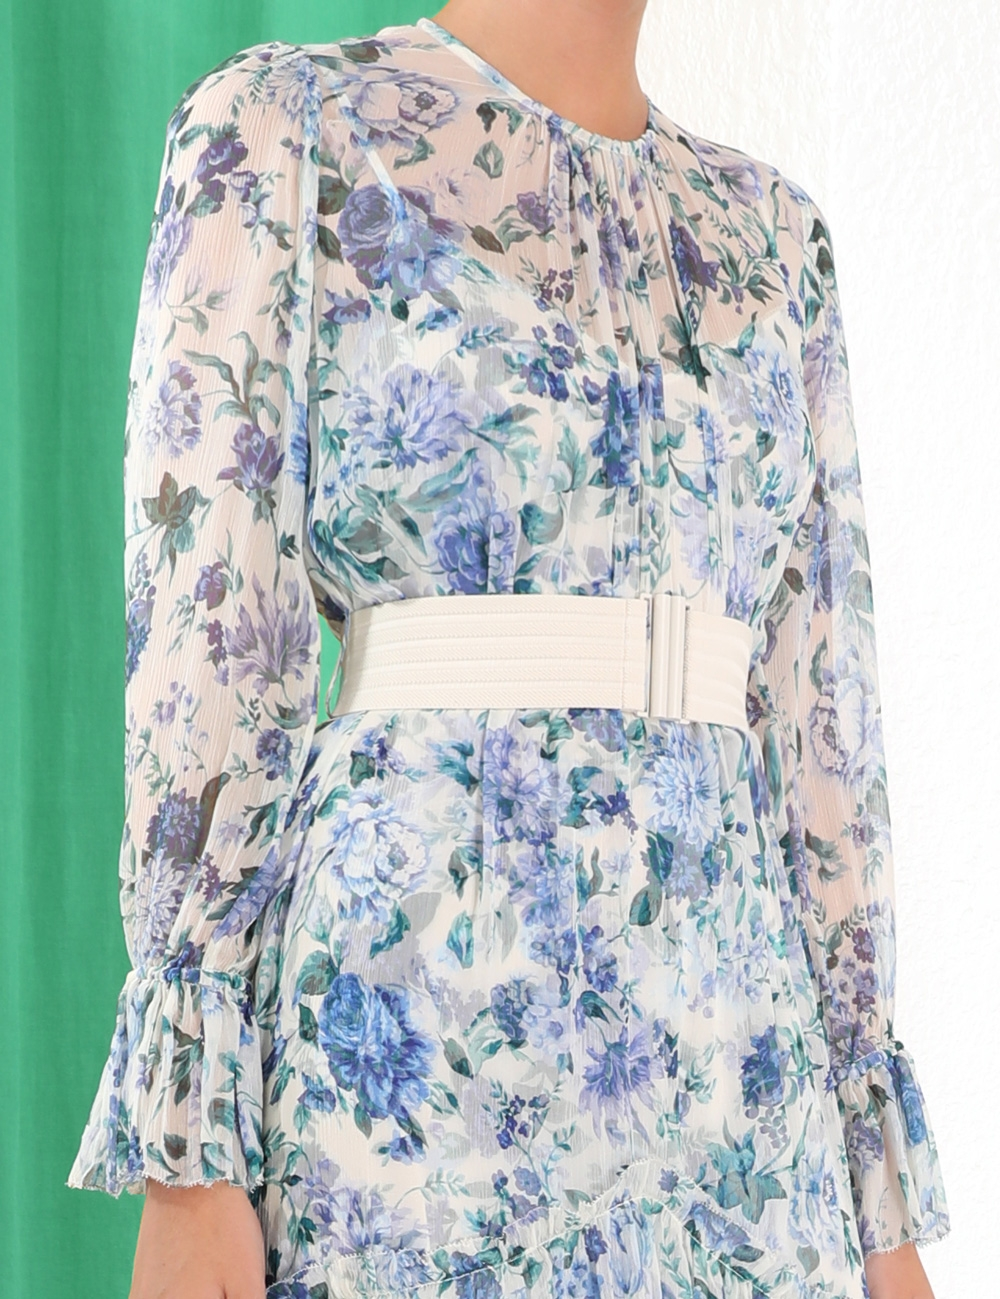 Moncur Chevron Frill Dress